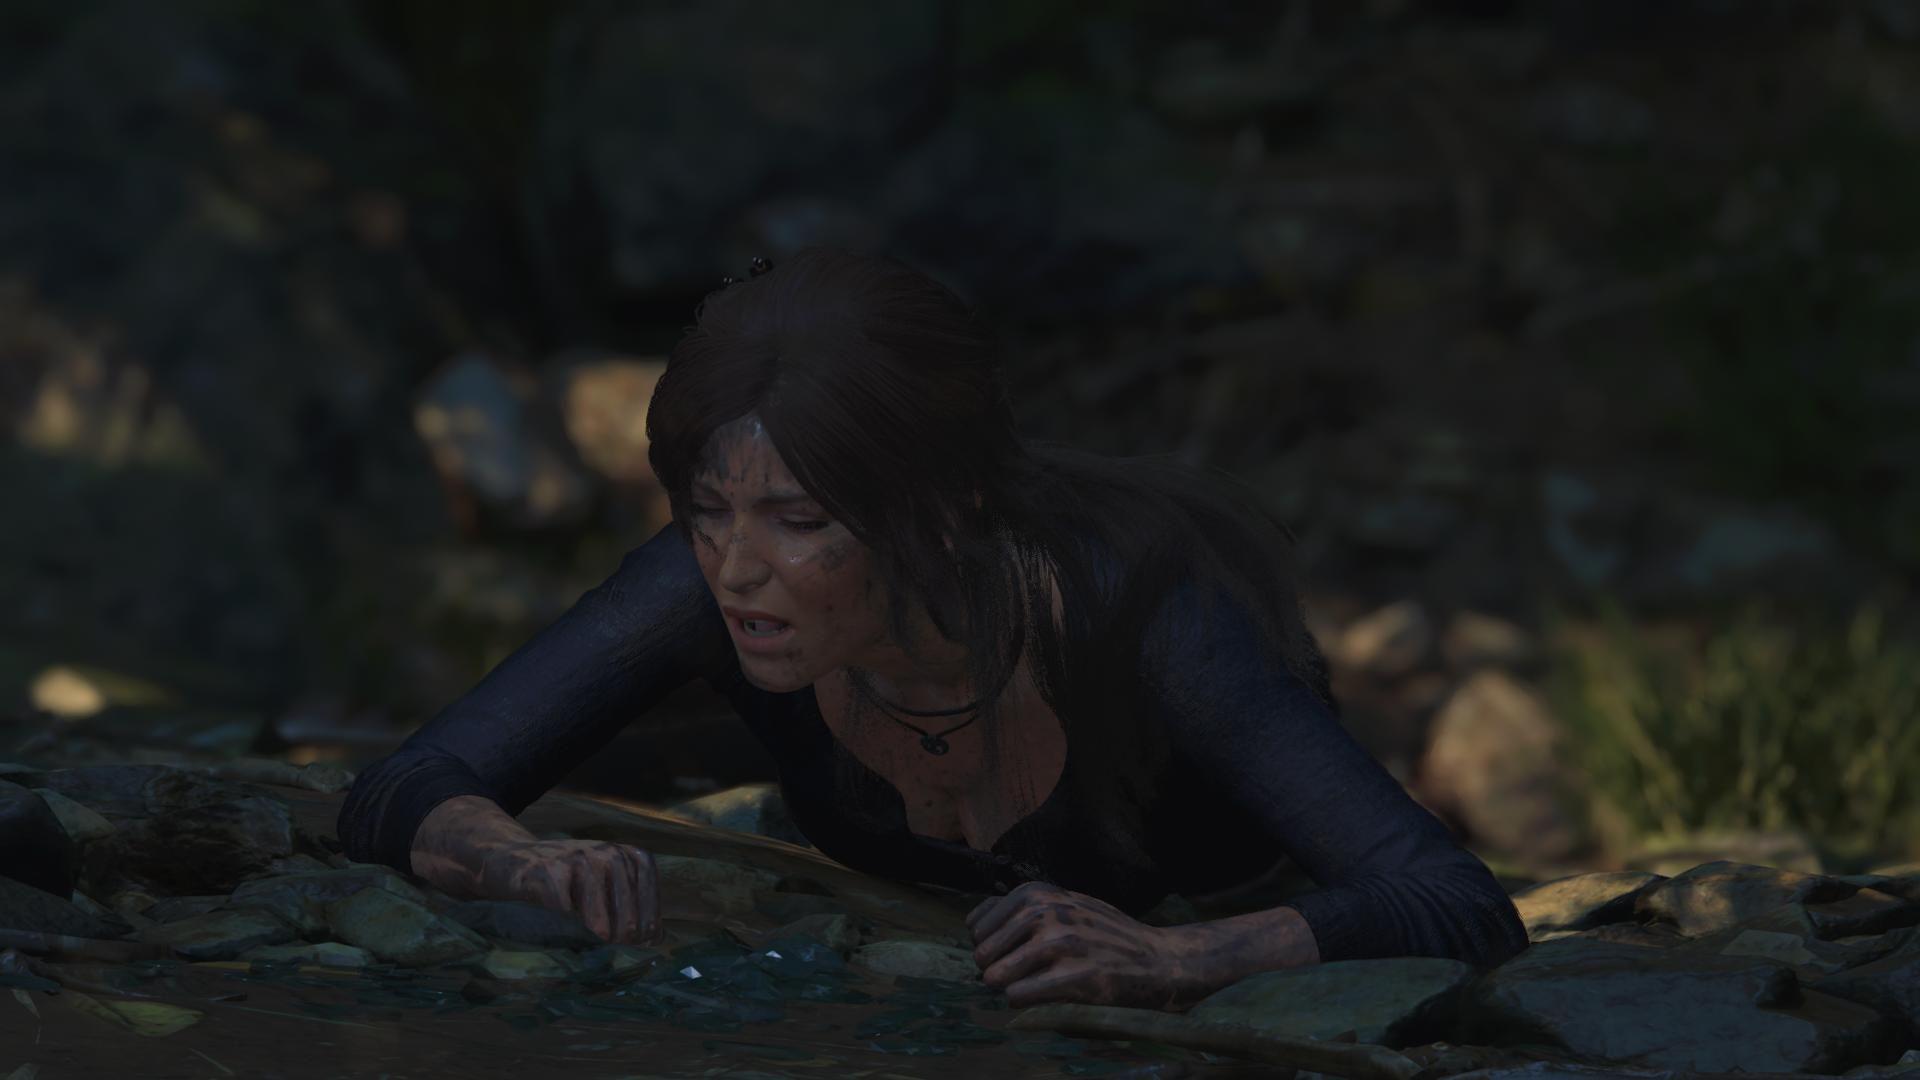 SOTTR 2018-10-19 13-04-39-51.jpg - Shadow of the Tomb Raider